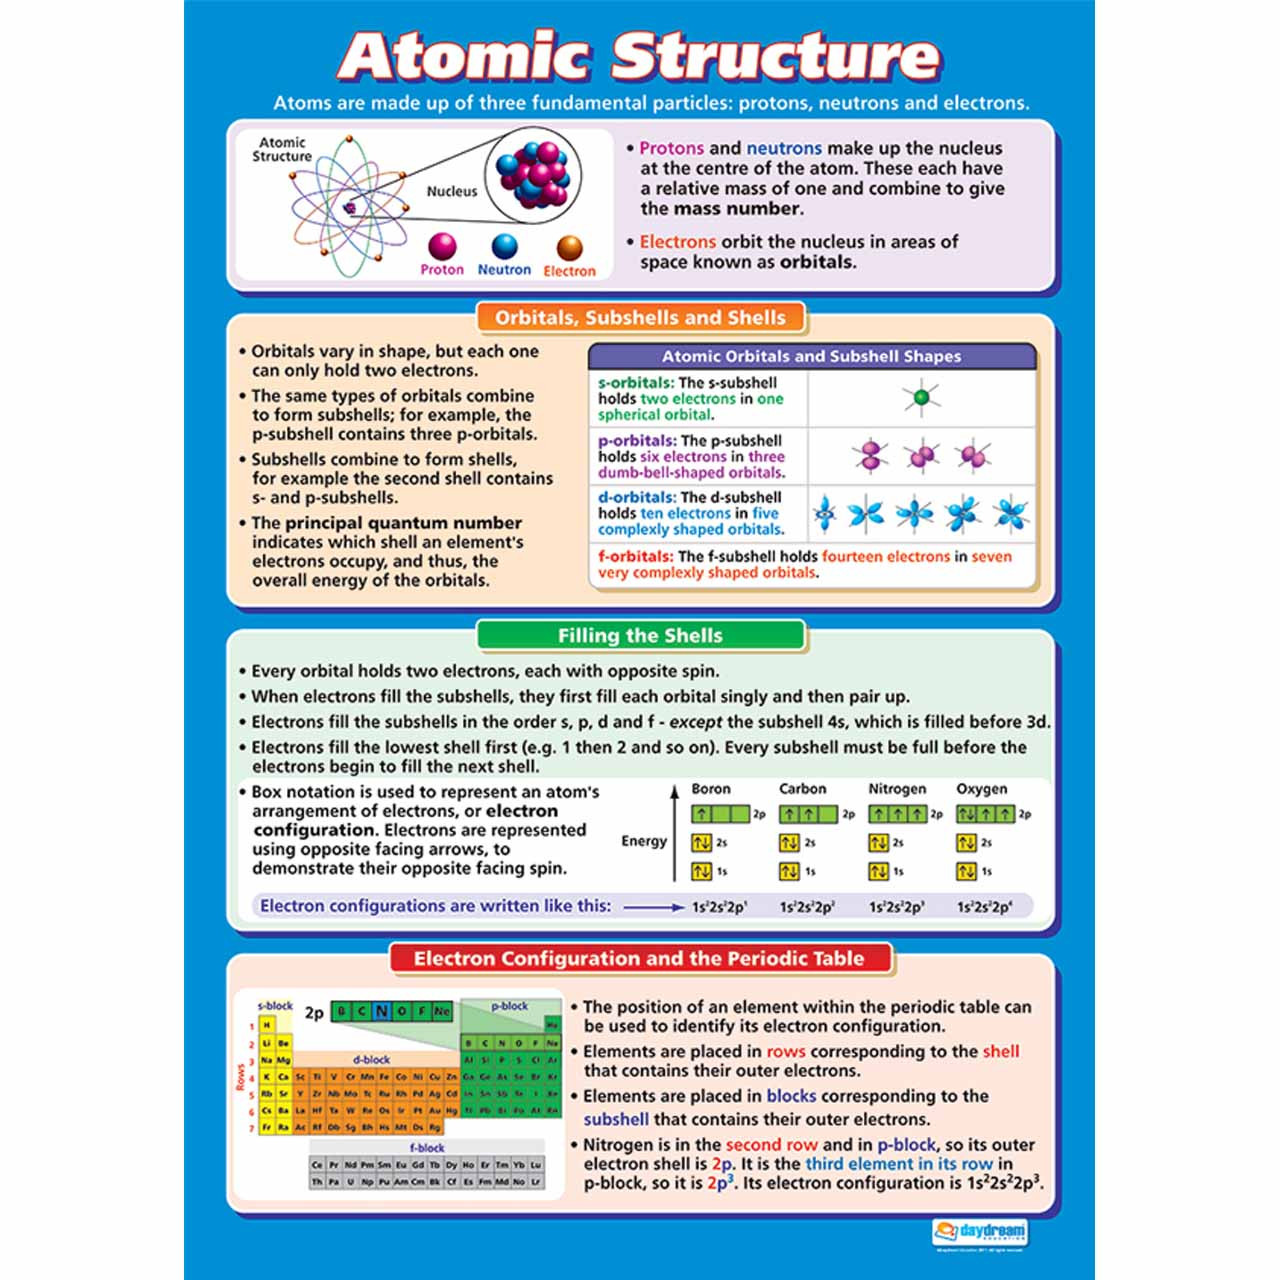 SAL007L - Atomic Structure Laminated